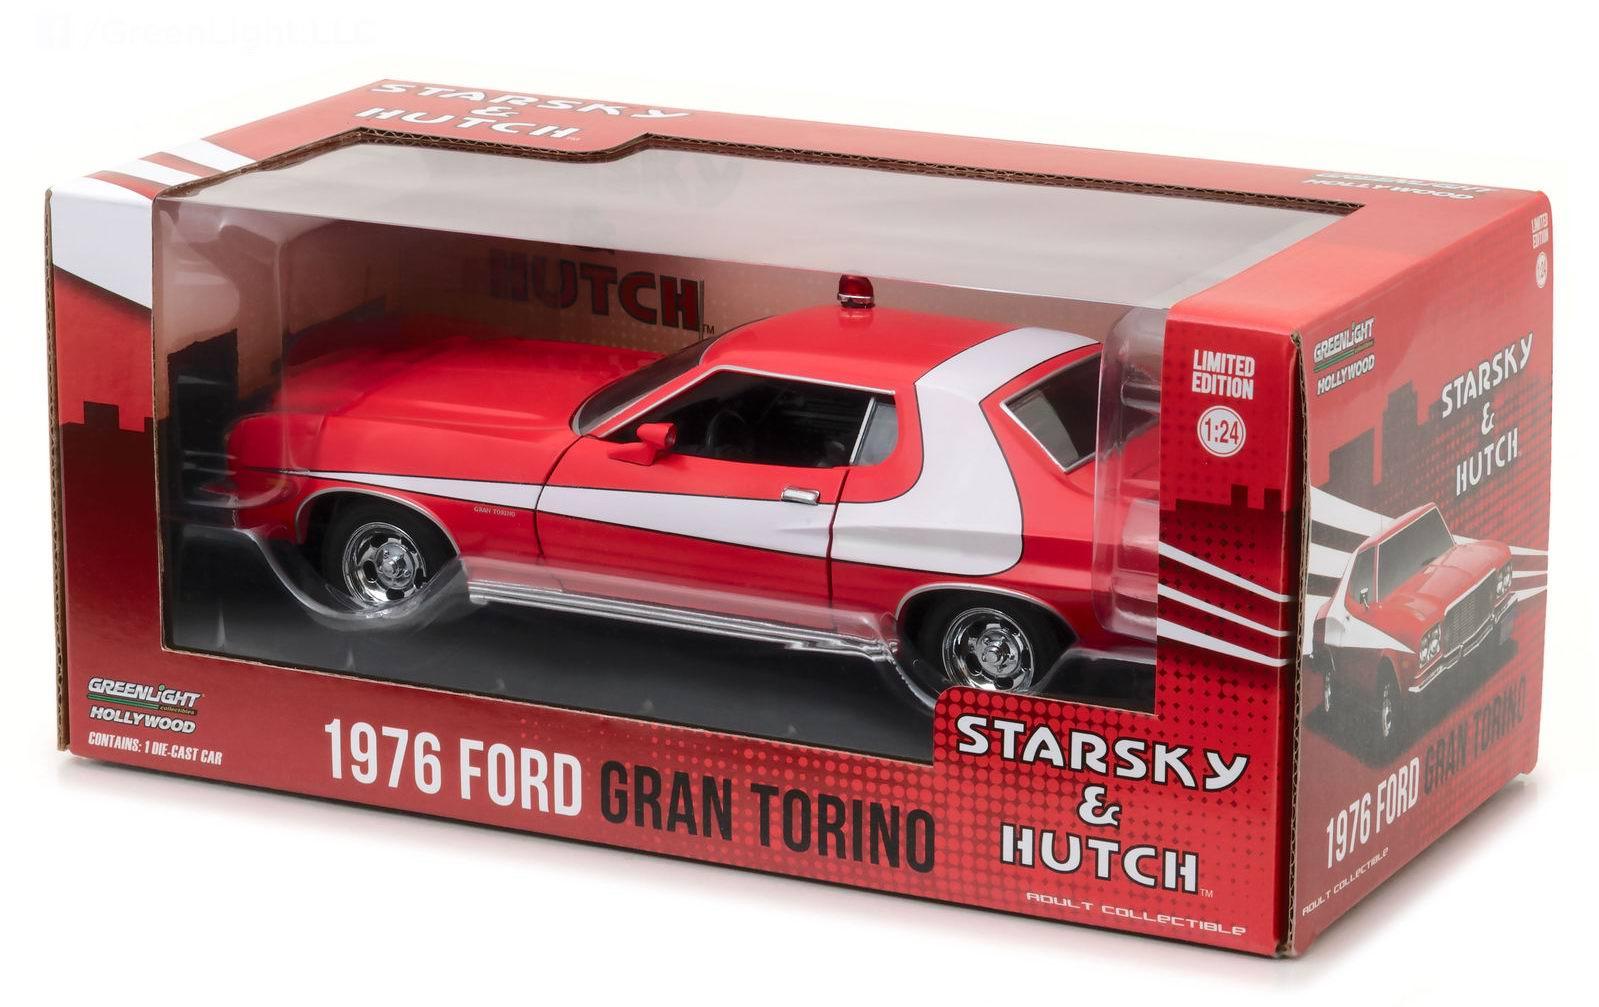 Voiture Ford Gran Torino Starsky et Hutch 1/24